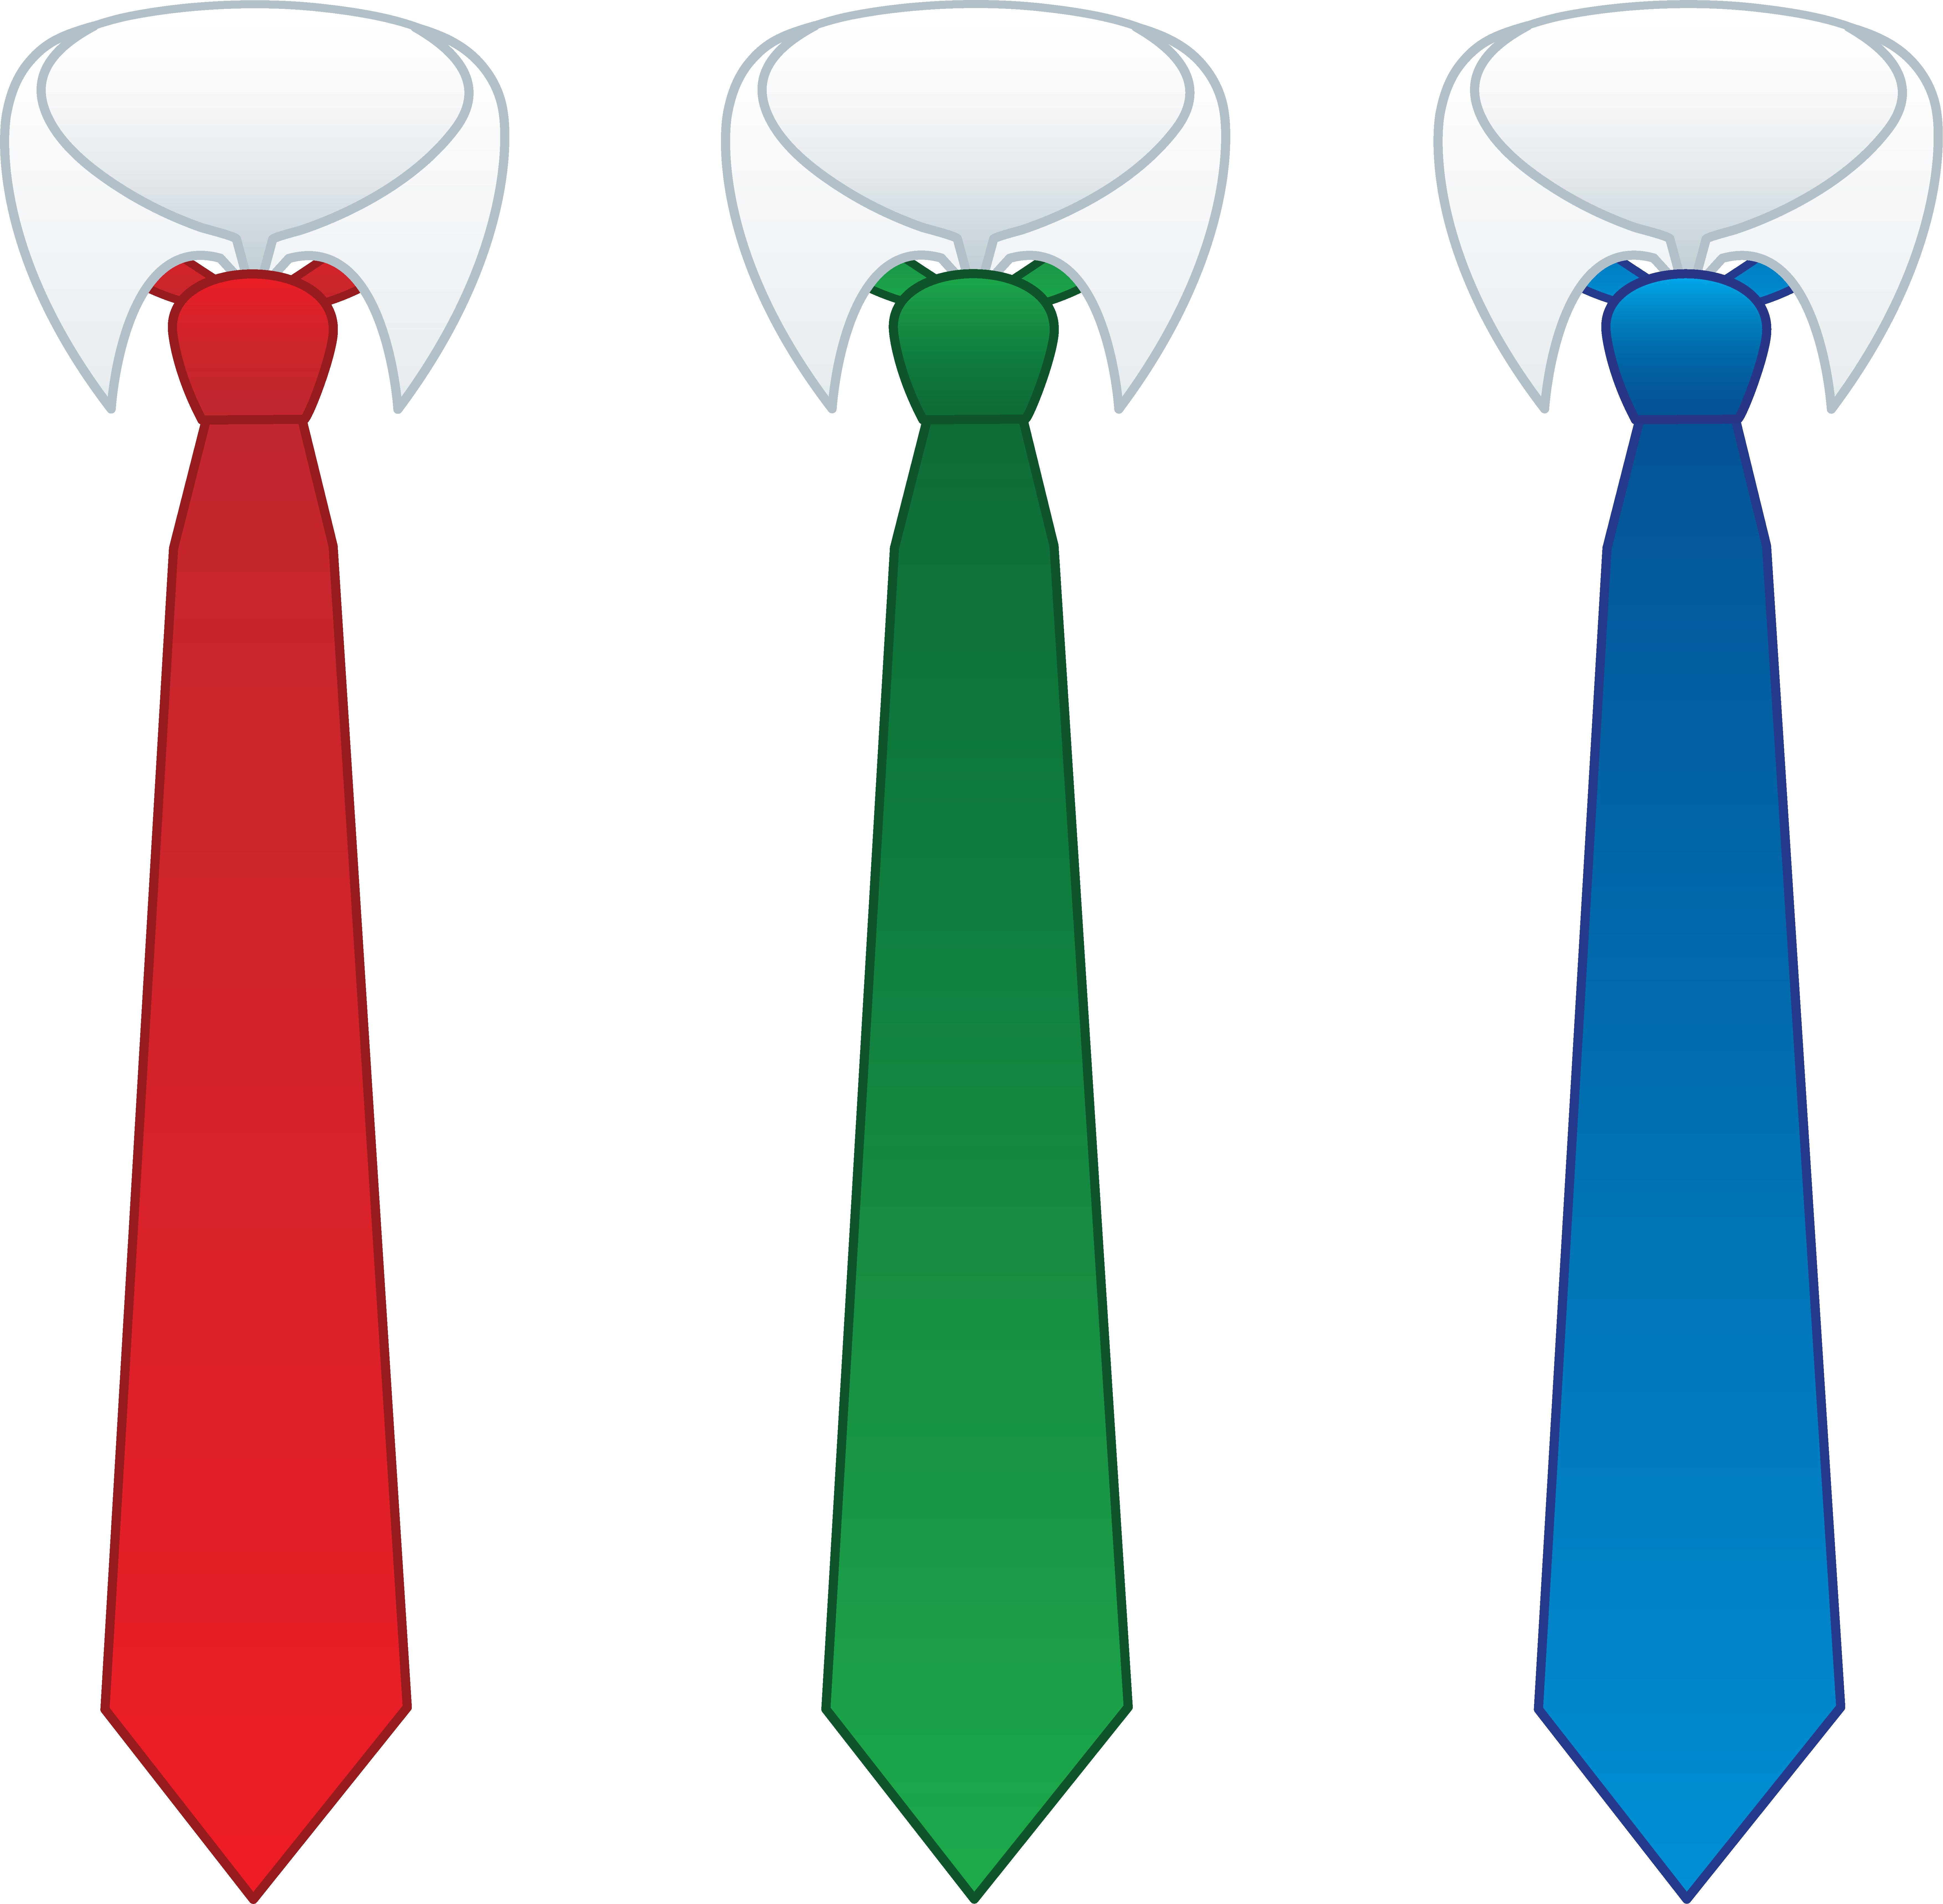 Thanksgiving tie clipart clip art stock Tie 20clipart | Clipart Panda - Free Clipart Images clip art stock